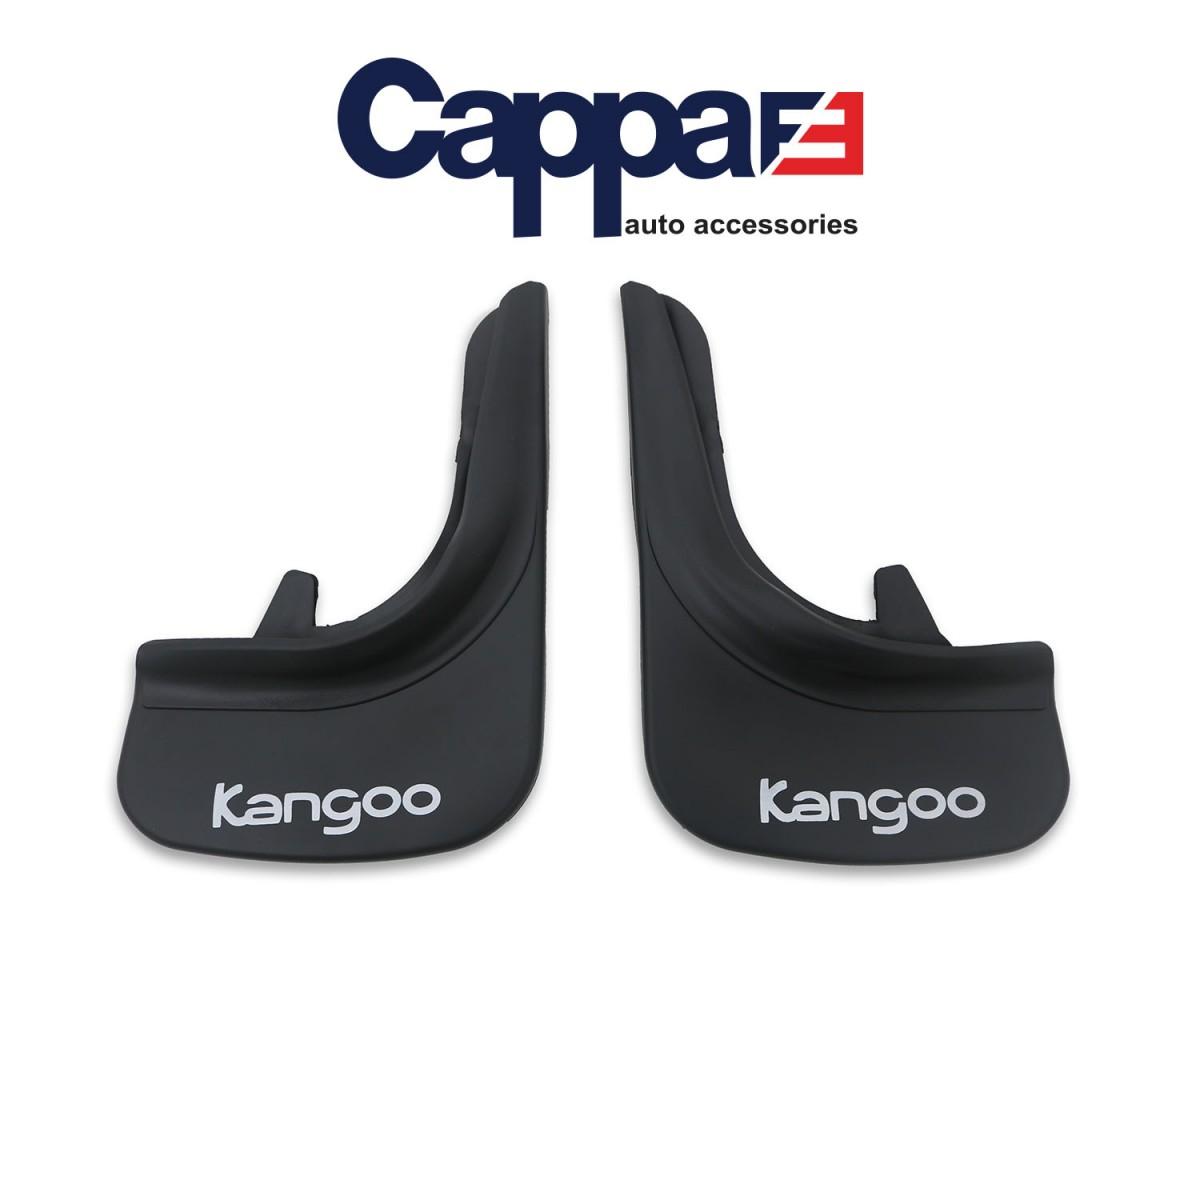 CAPPAFE Kangoo Paçalık Tozluk Set 2 Parça Bütün Modellere Uyumlu